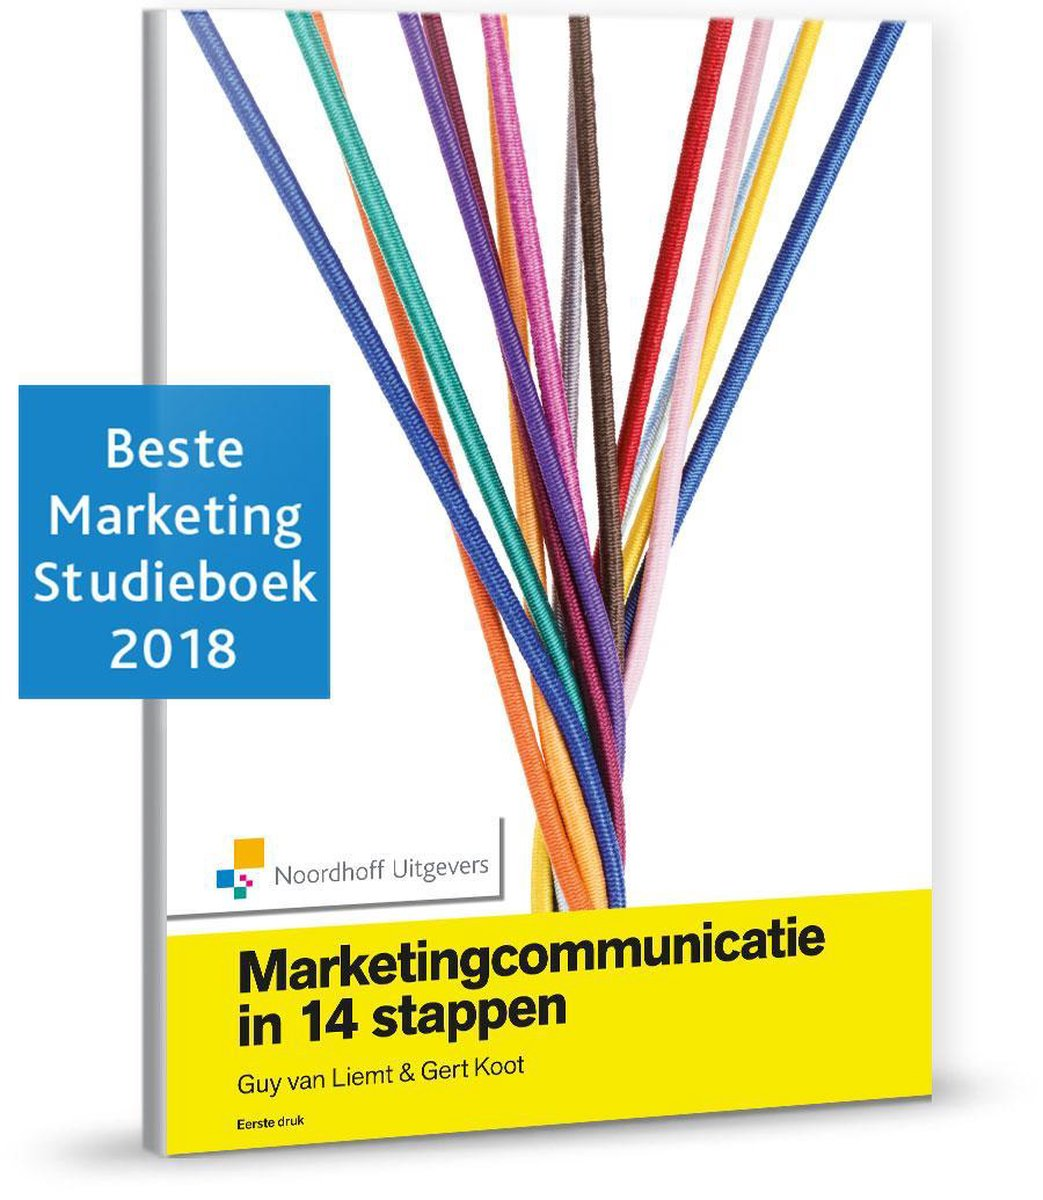 Marketingcommunicatie in 14 stappen - Guy van Liemt